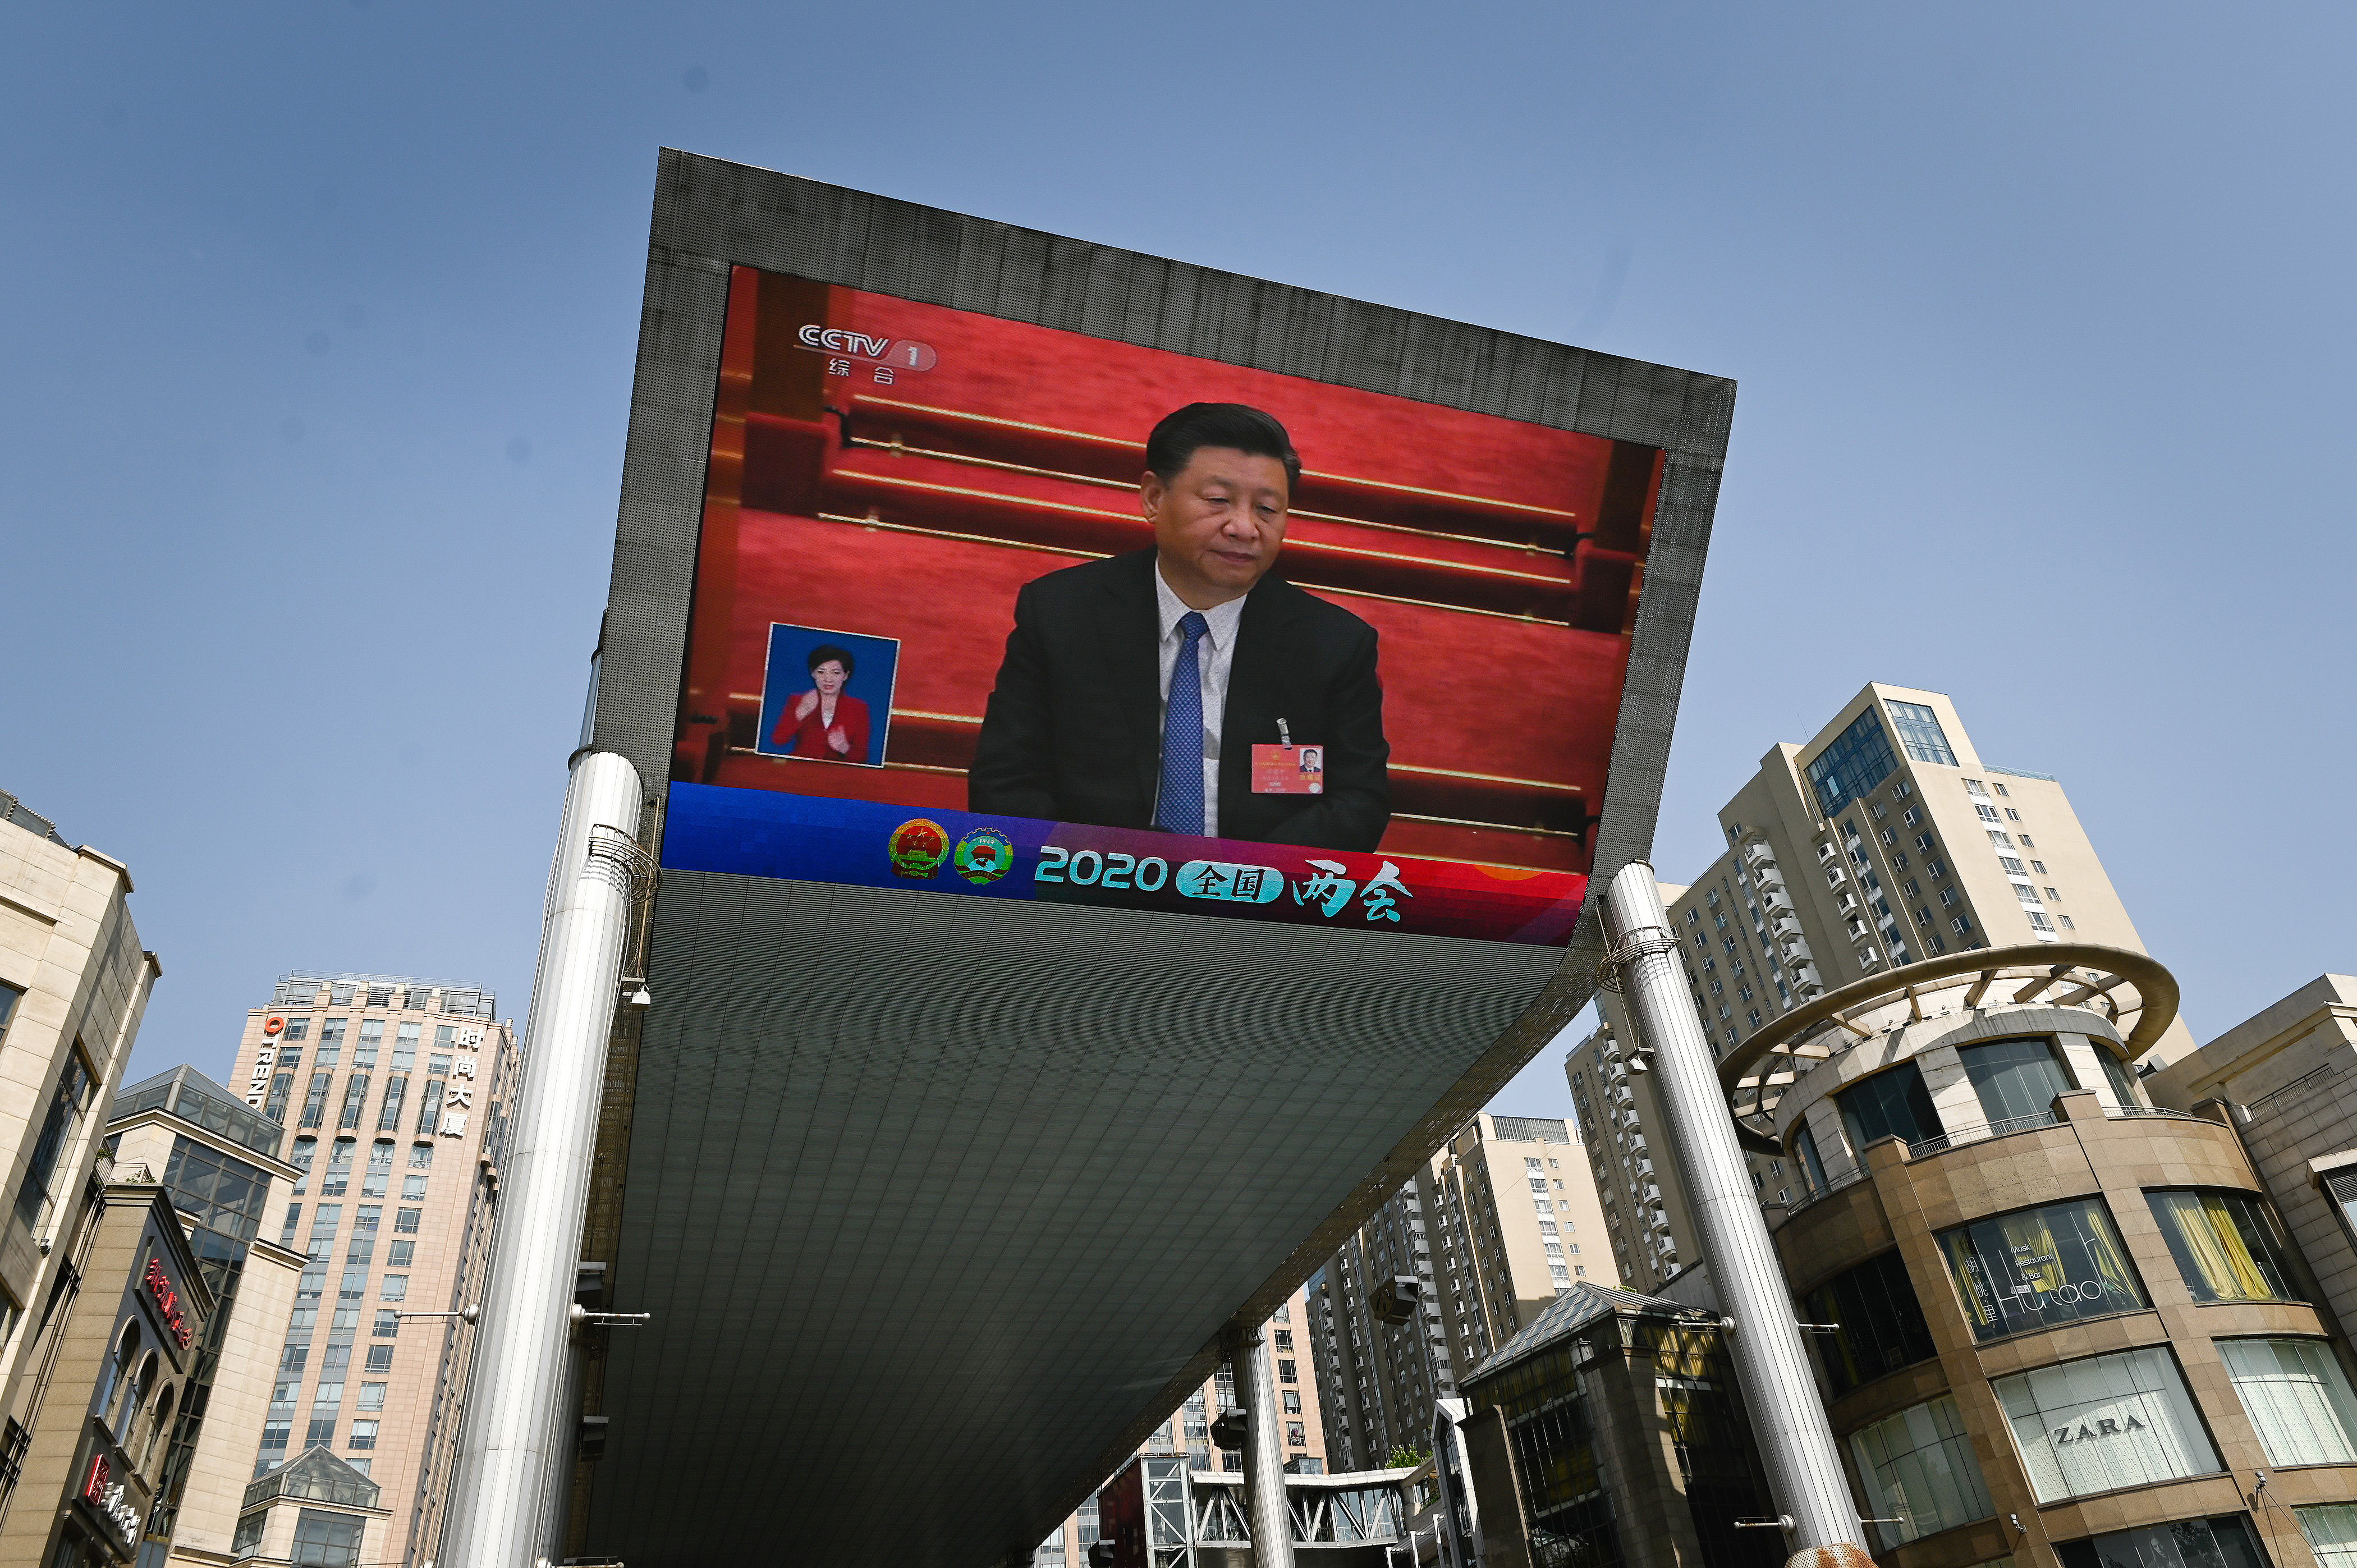 China Uses Globalization to Shut Down Critics Worldwide